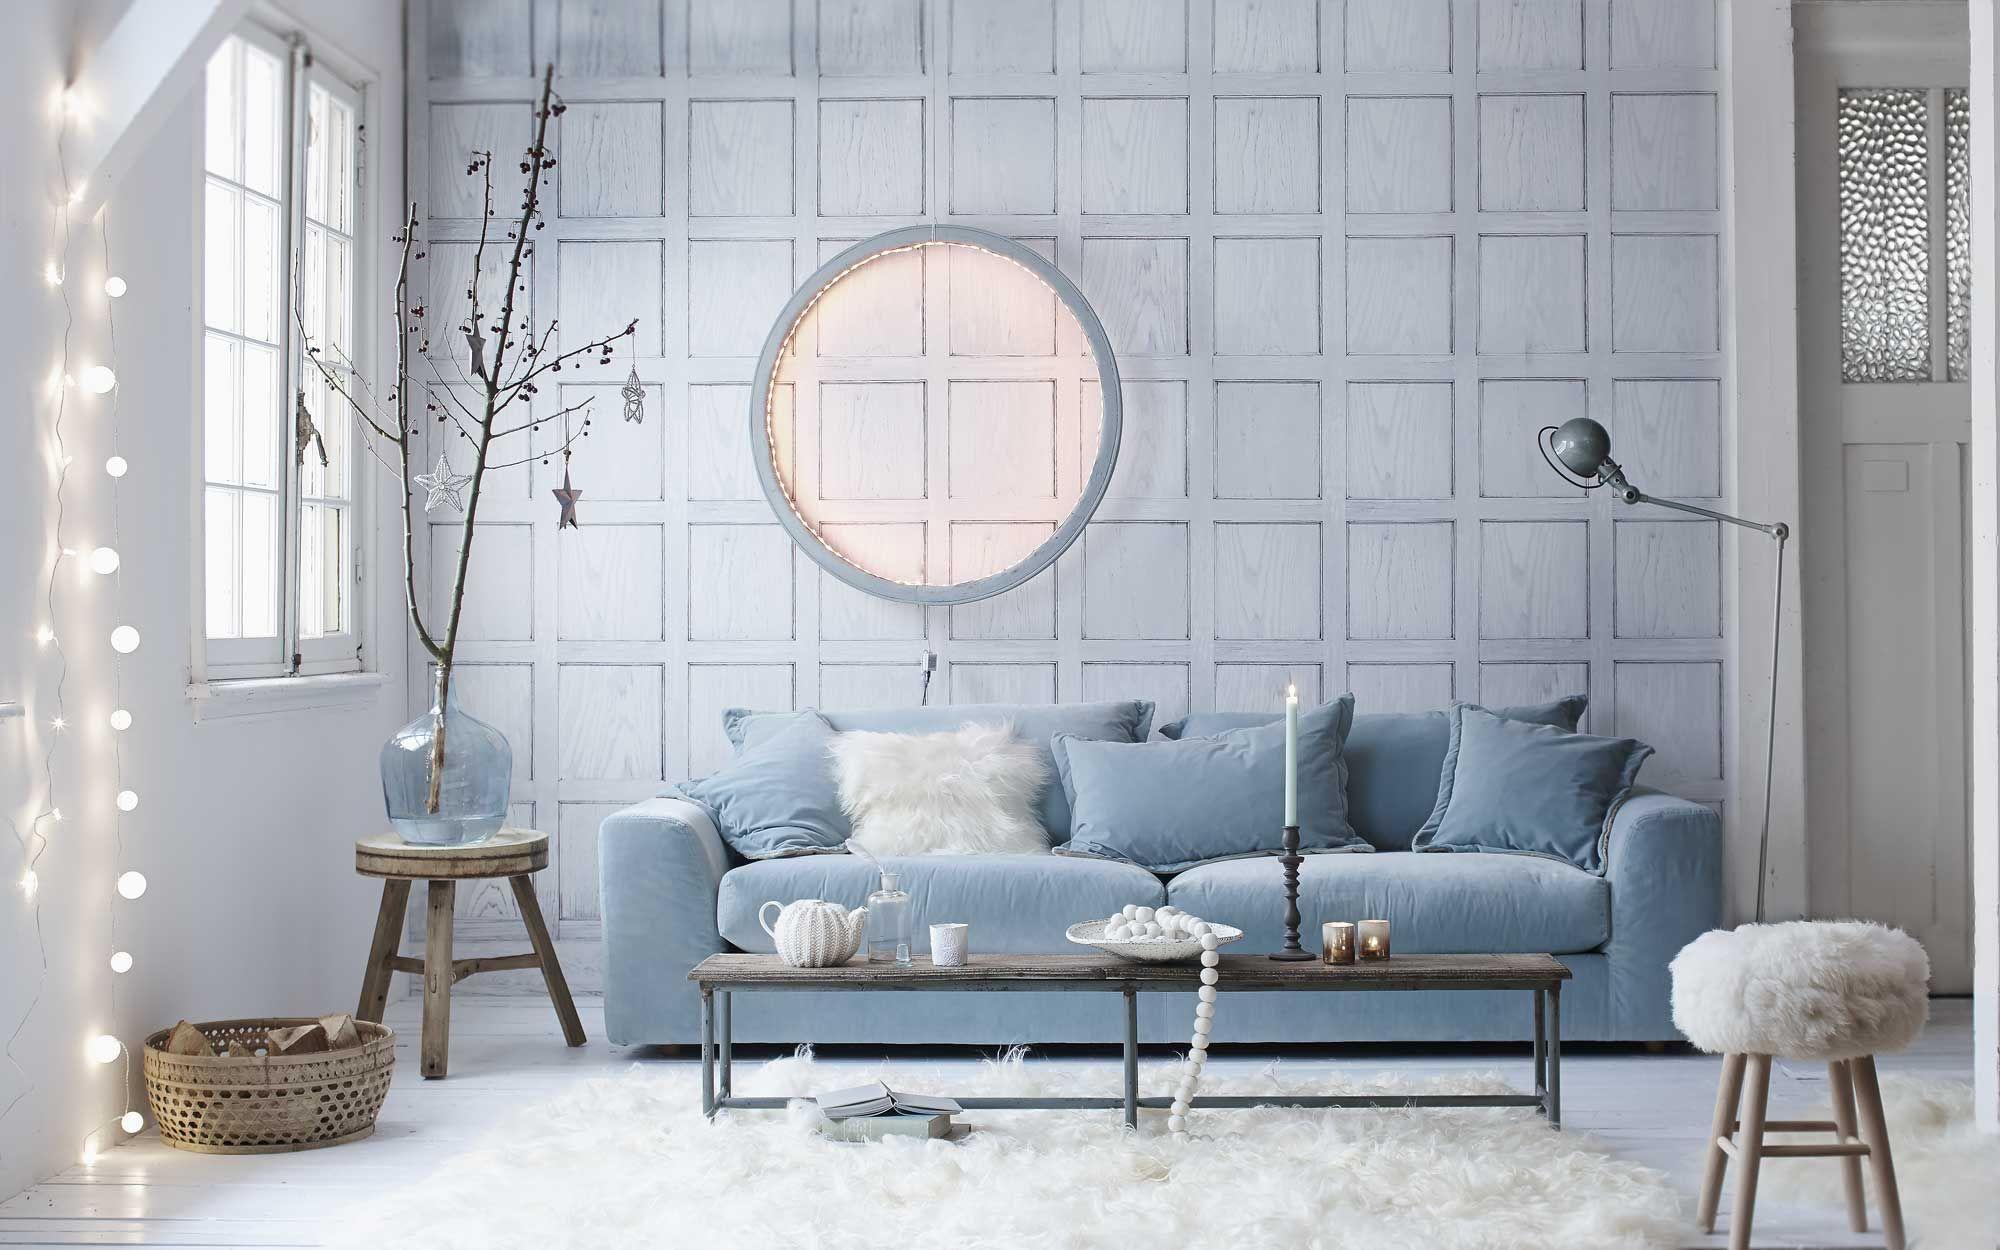 Interieur Ice Blauw : Blauwe woonkamer met sfeerverlichting blue living room with